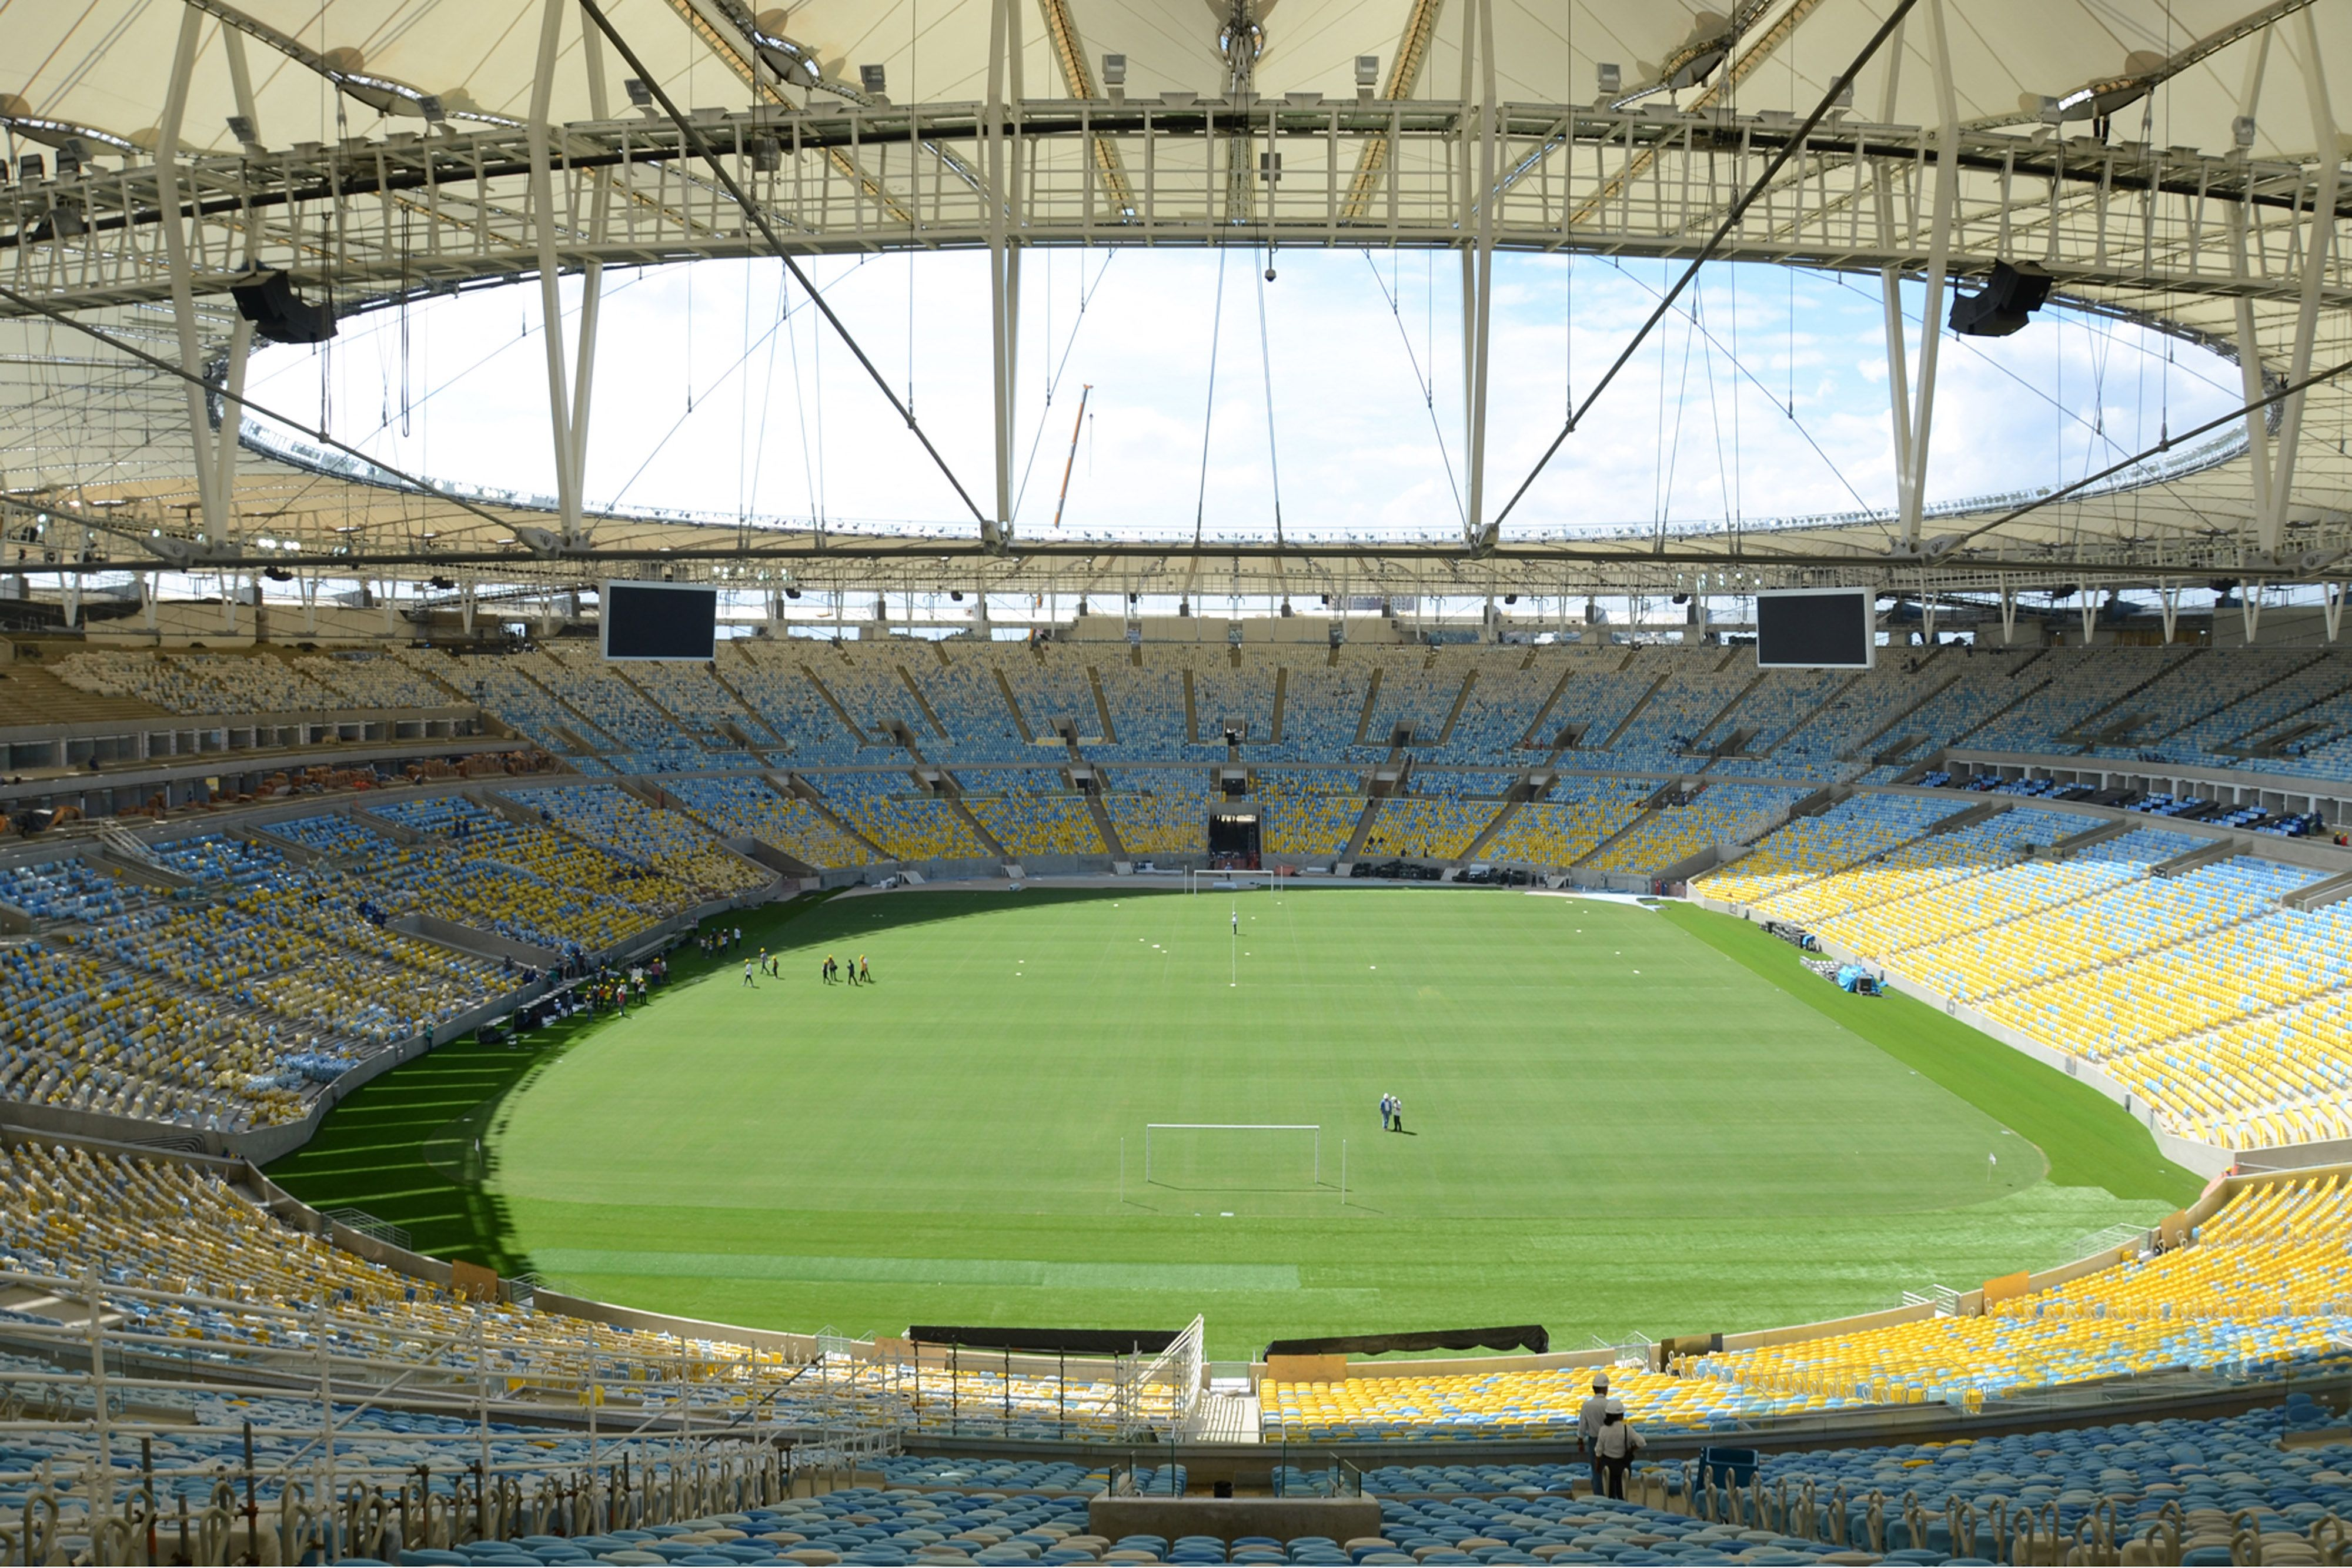 Érica Ramalho/Governo do Rio de Janeiro [CC BY 3.0 br (http://creativecommons.org/licenses/by/3.0/br/deed.en)], via Wikimedia Commons